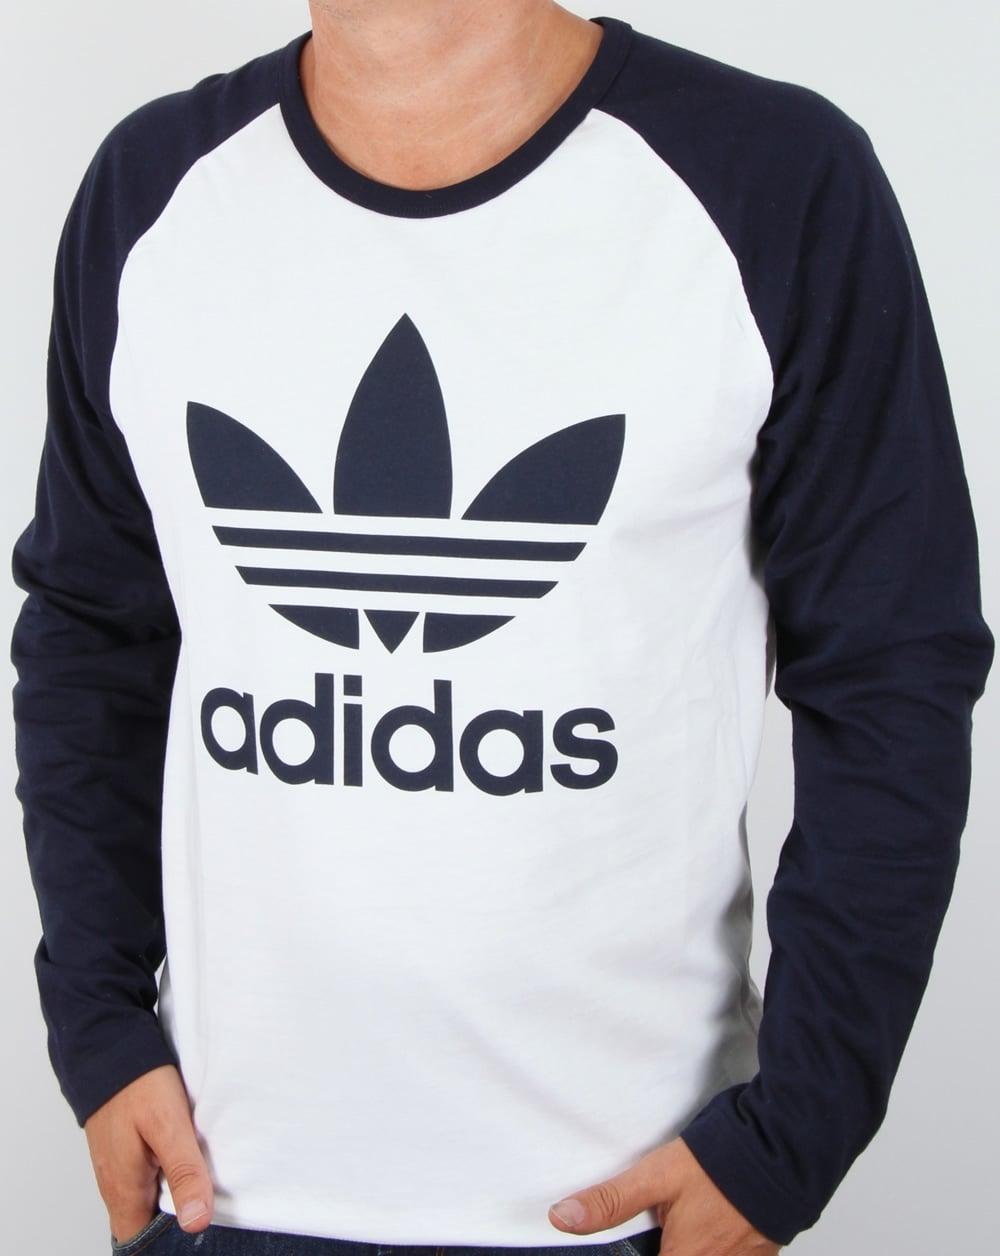 Adidas Originals Trefoil Long Sleeve Raglan T shirt WhiteNavy